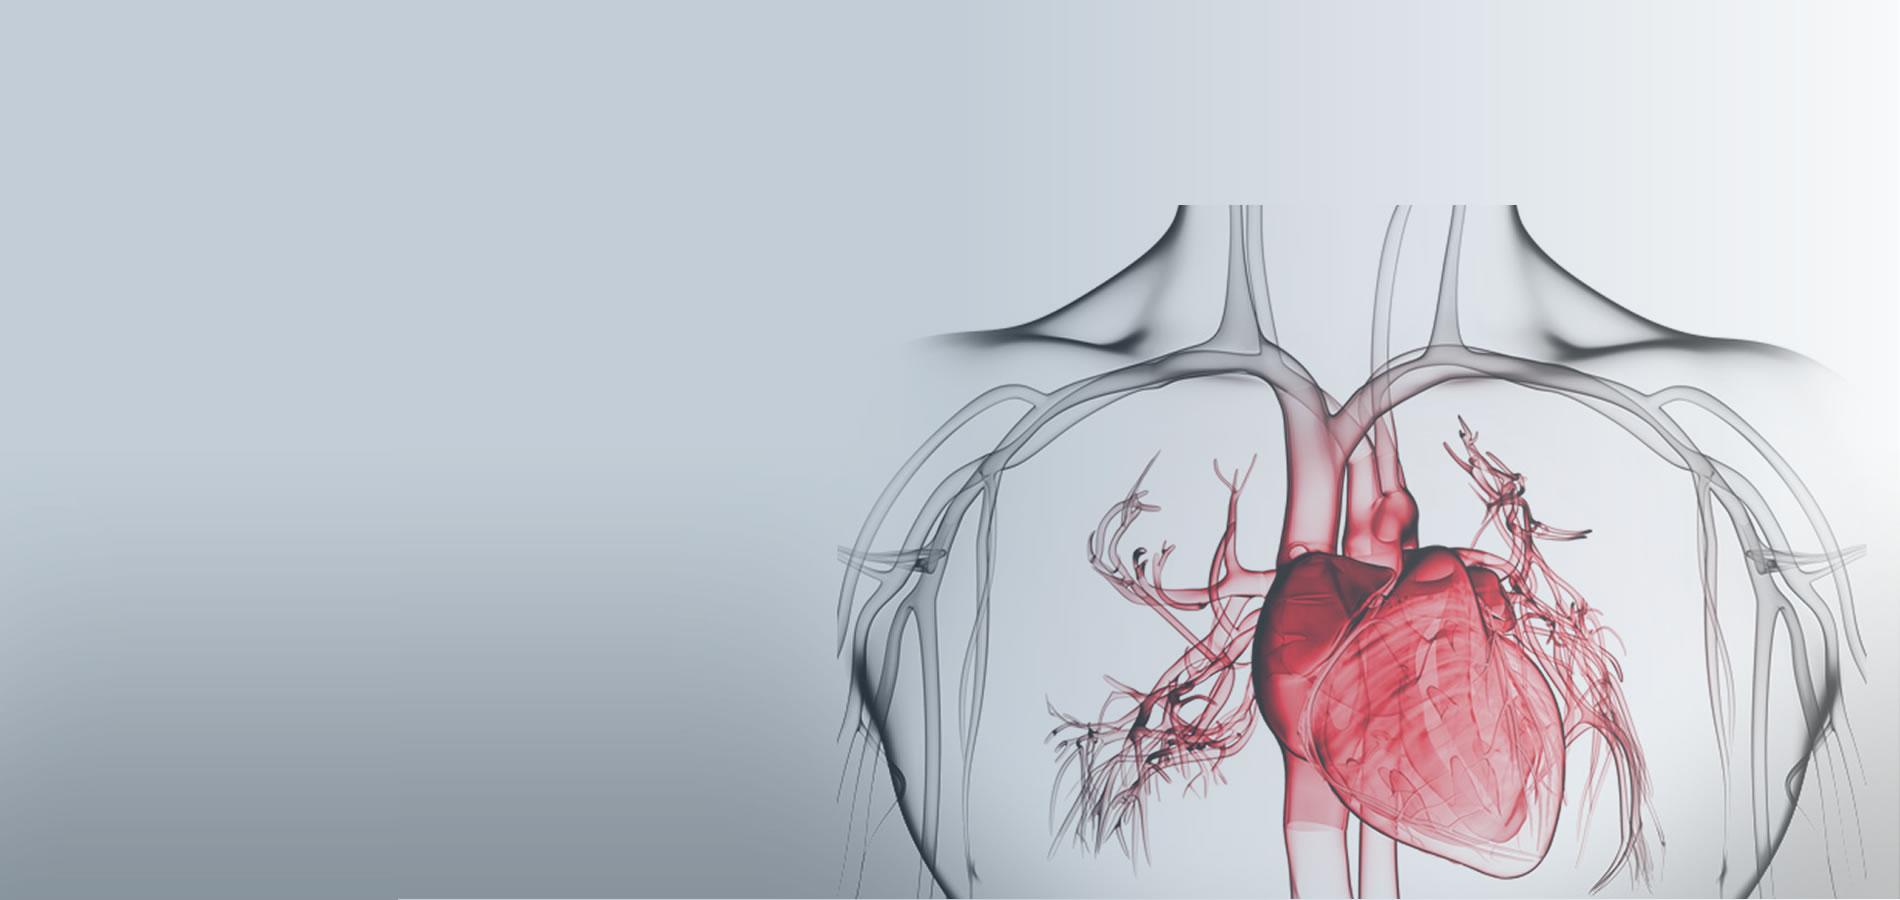 cardiotech health care ireland official enverdis cardiological vascular equipment supplier hospitals